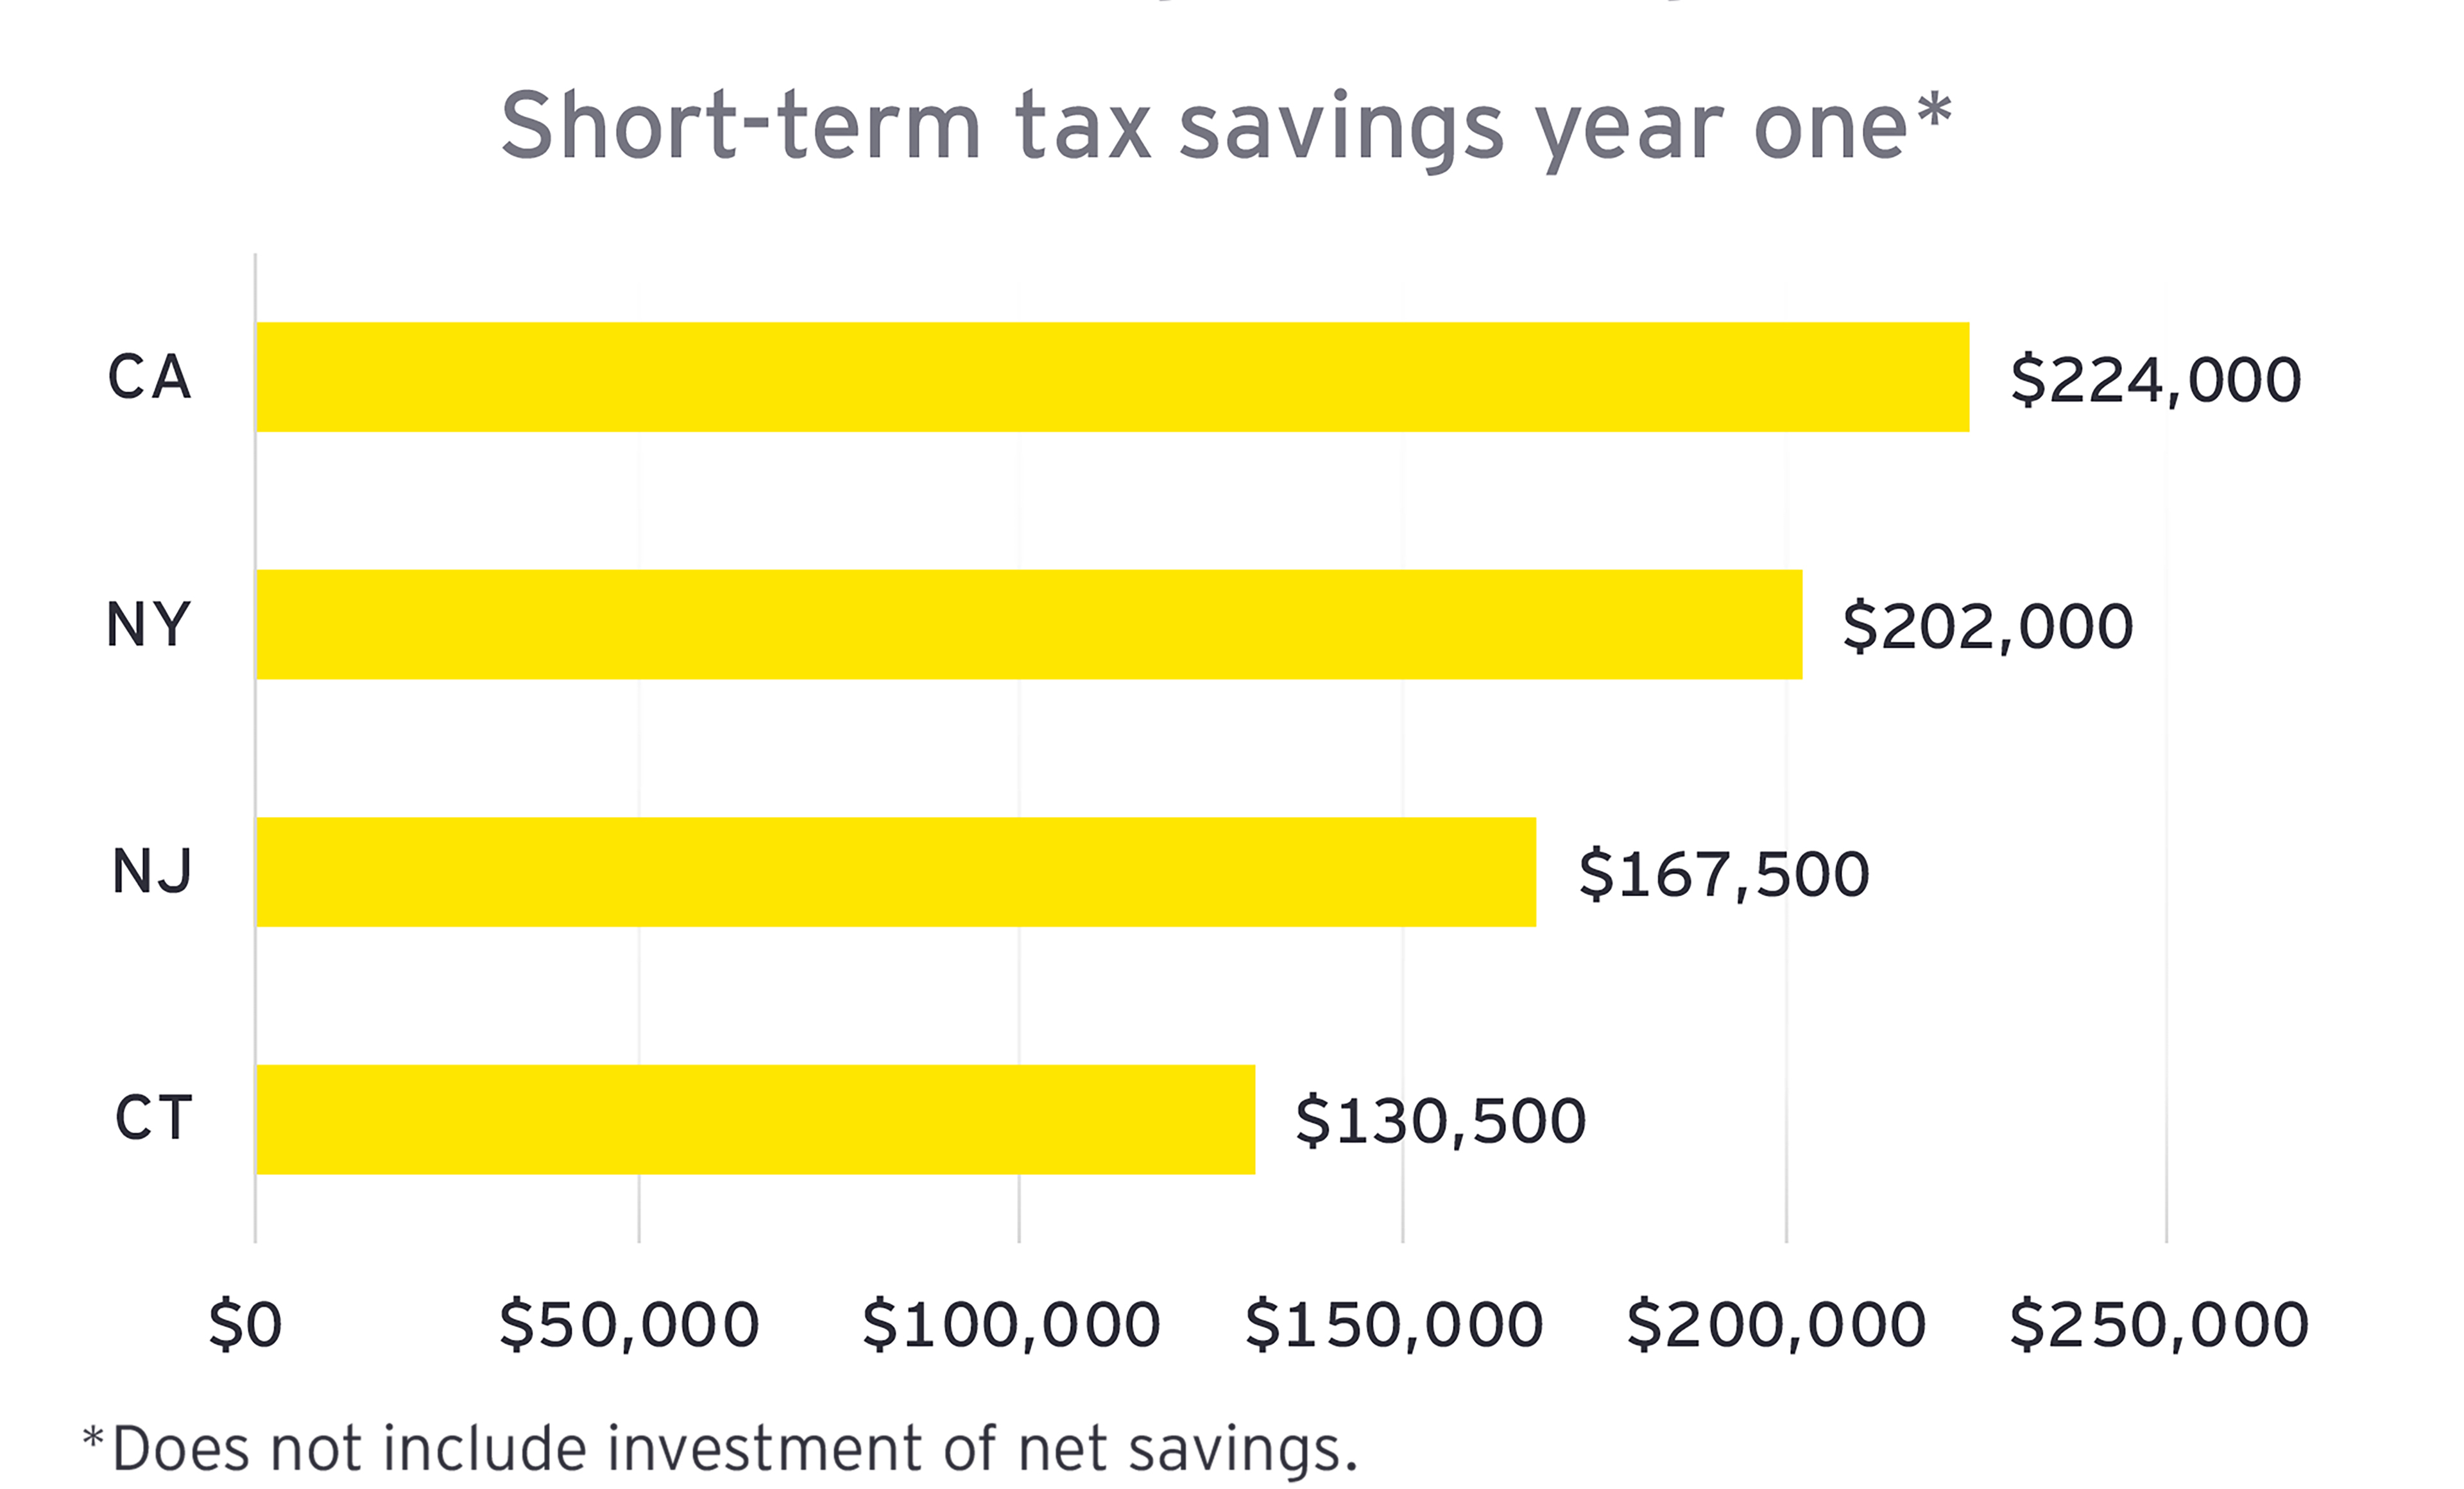 EY - Short term tax savings year one